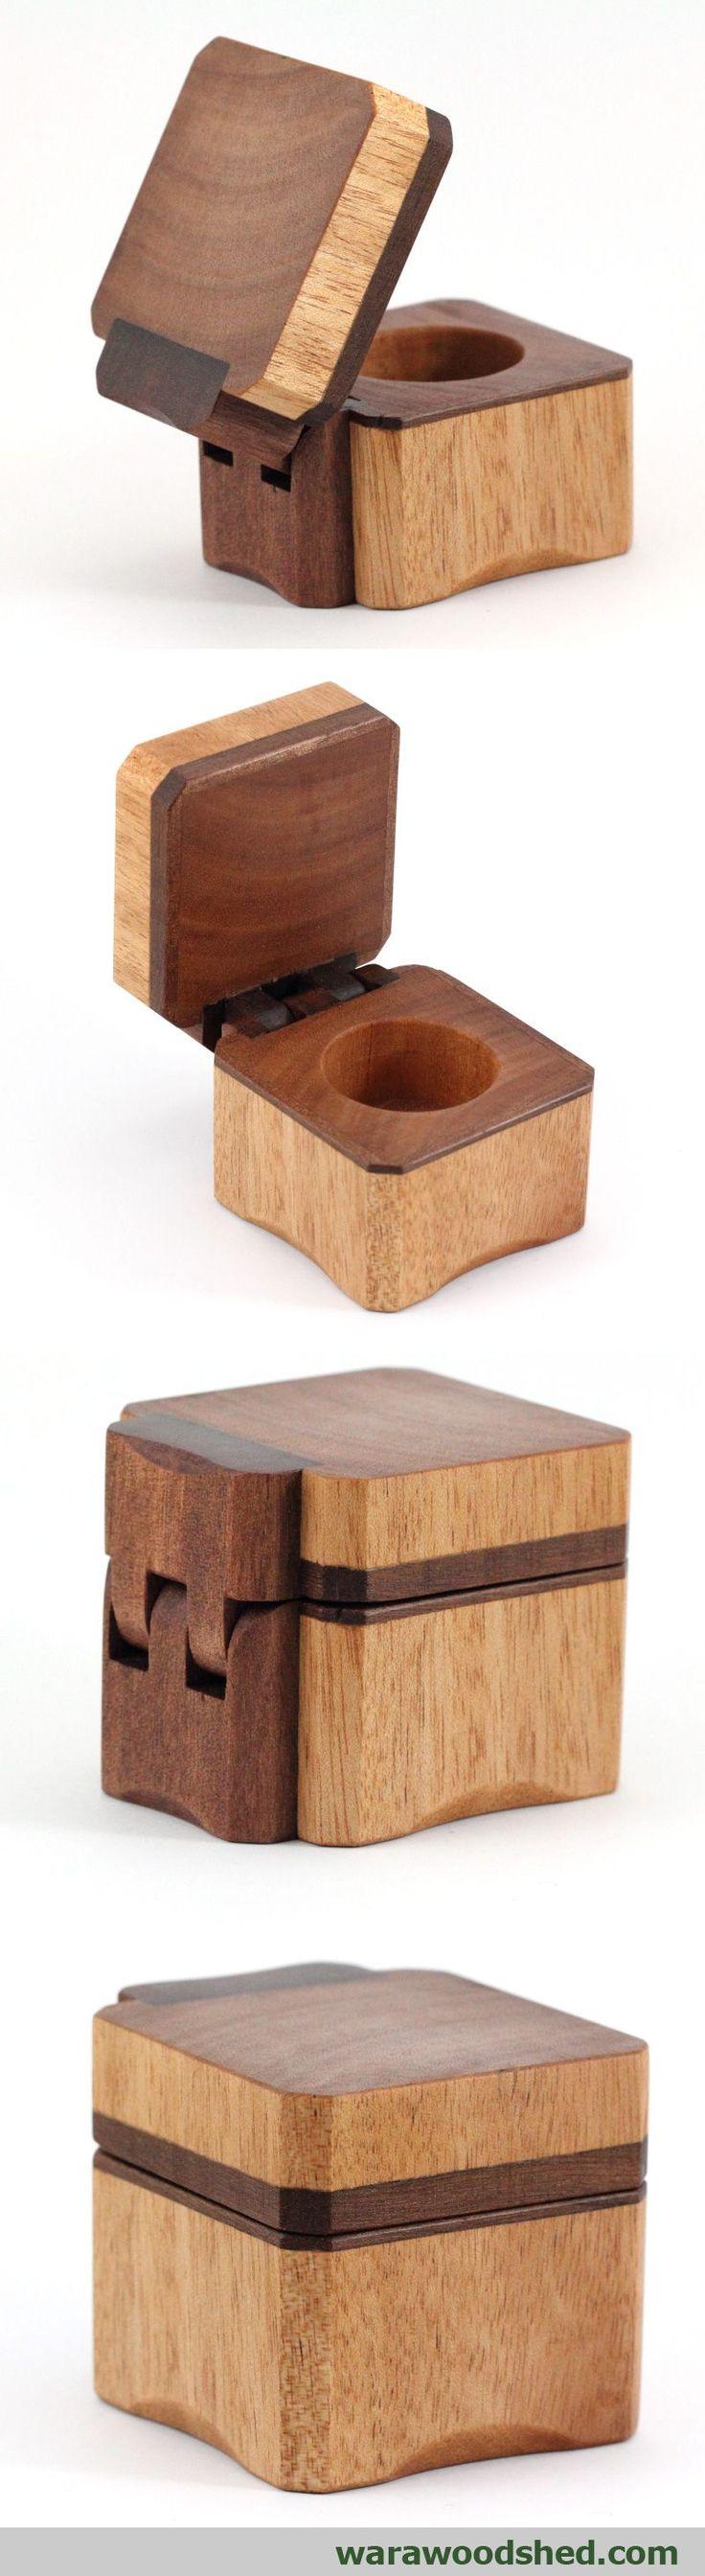 Best 25 Wooden ring box ideas on Pinterest